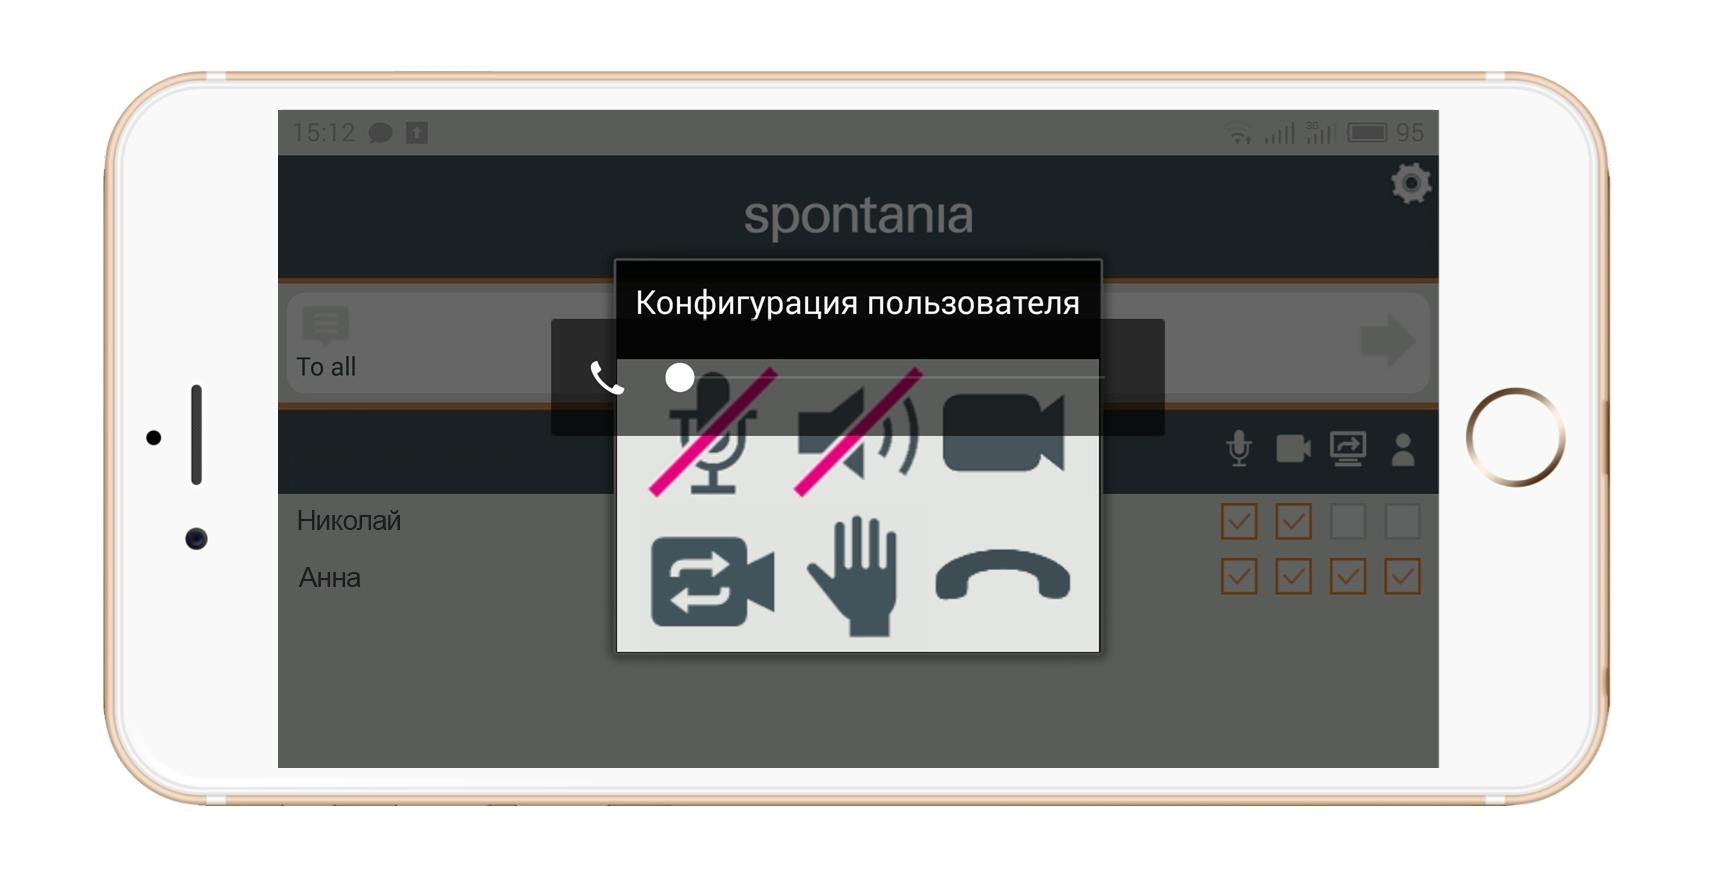 ClearOne Sp St Base 1 - Программный продукт Spontania Standard - Base 1